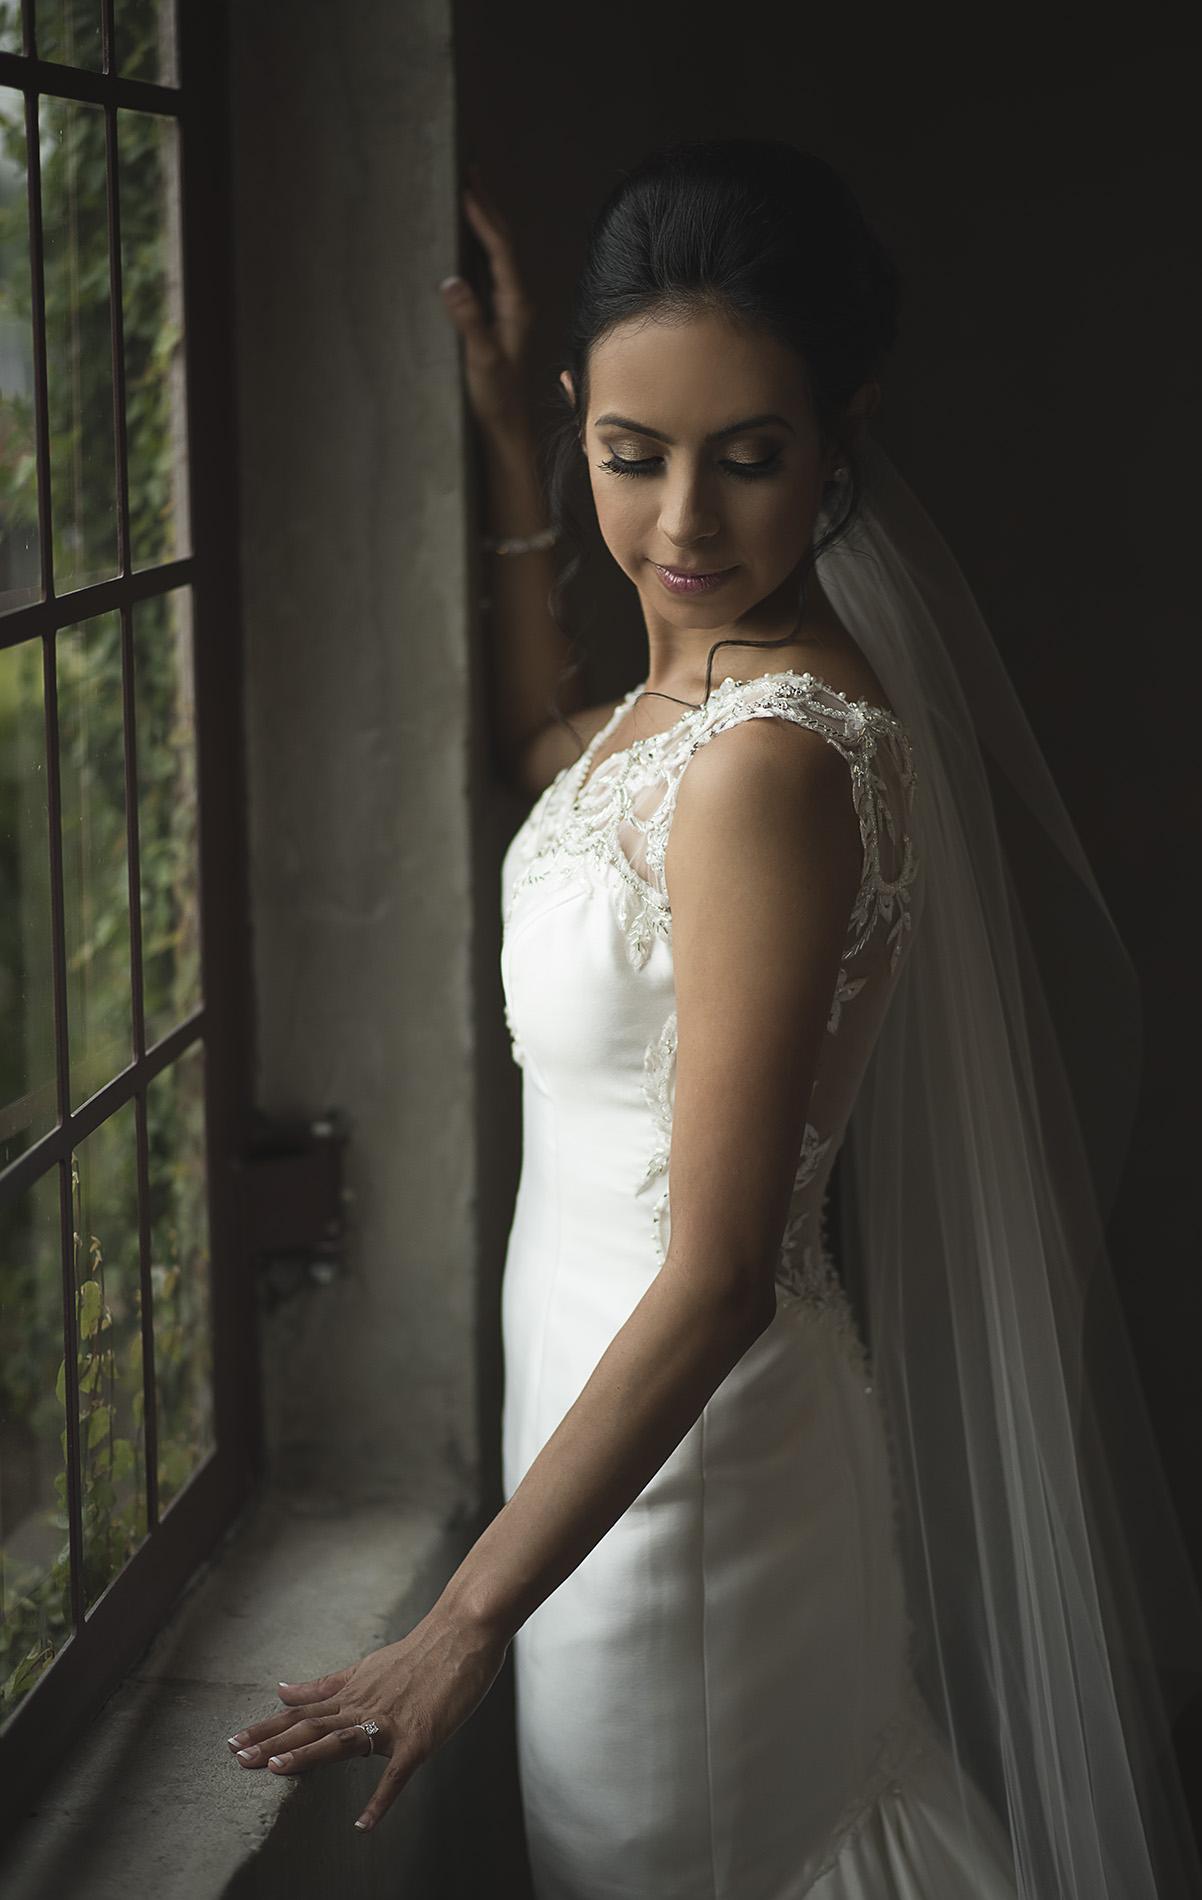 Houston-venue-Olde-Dobbin-Station-Romantic-Classic-Wedding-Photographer-044.jpg